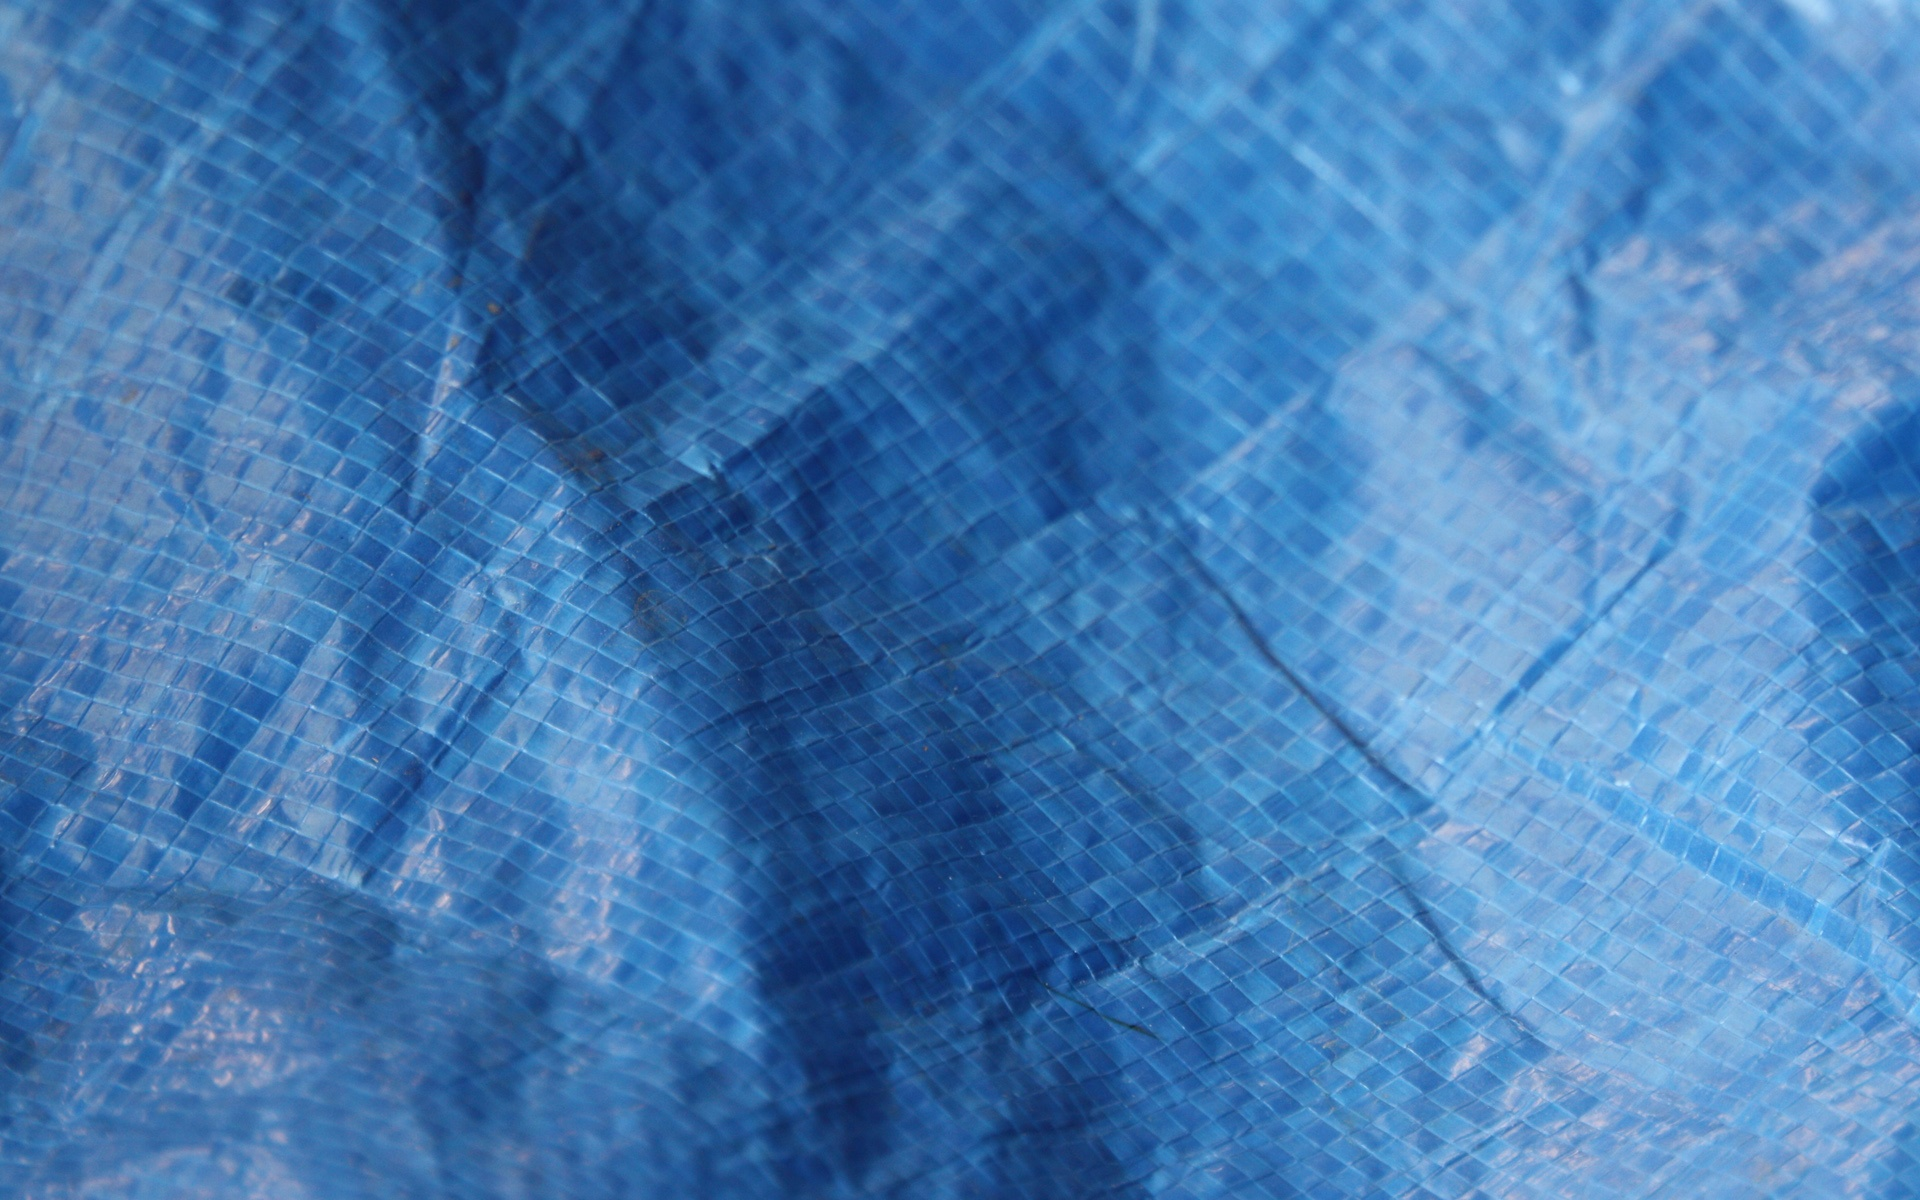 comwallpapersblue plastic faux alligator skin texture 1920x1200jpg 1920x1200